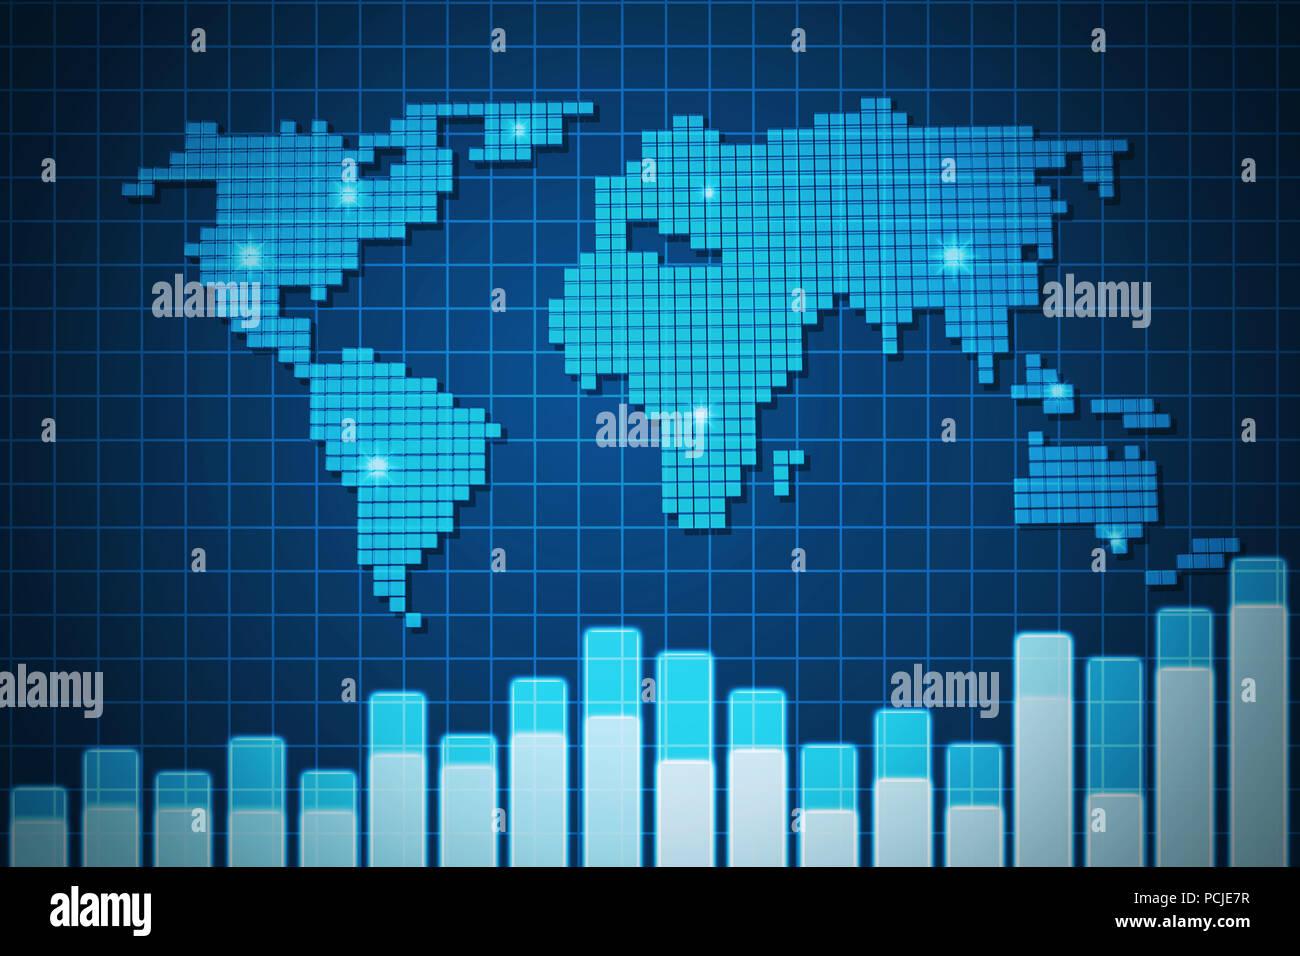 Blue screen digital world map and volump chart on grid background blue screen digital world map and volump chart on grid background illustration gumiabroncs Choice Image